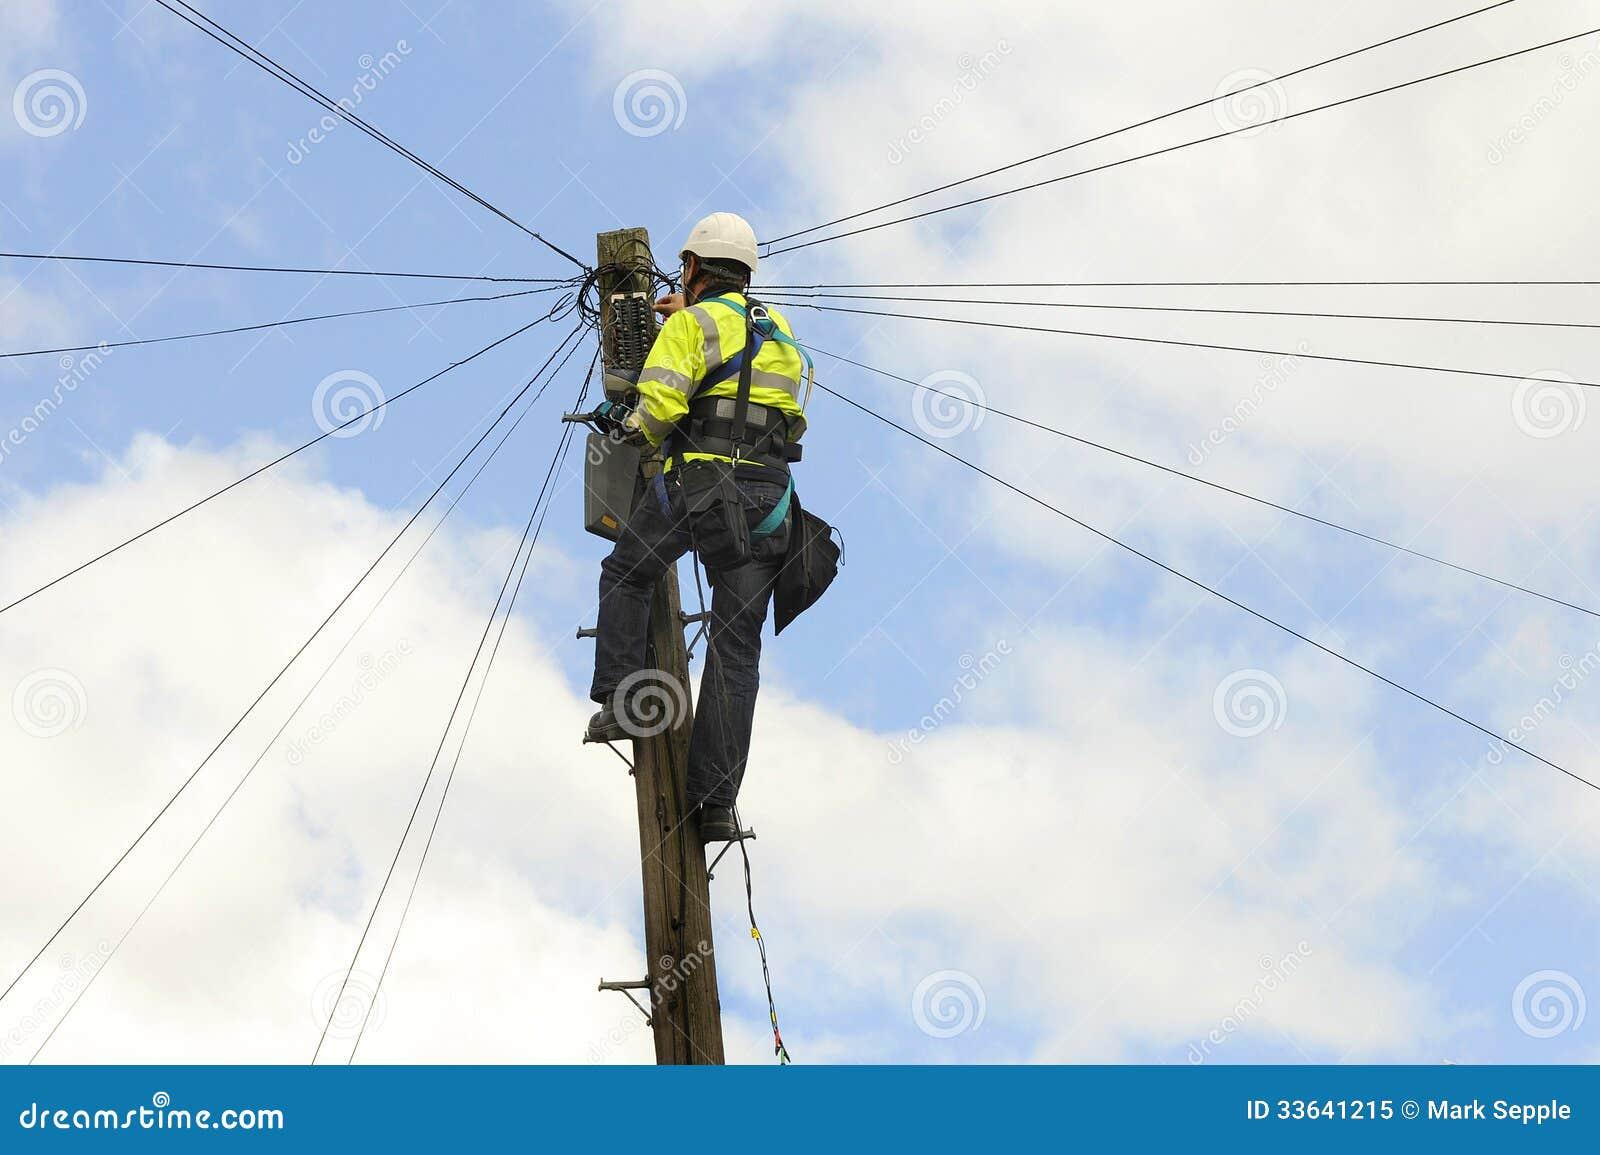 Telecom Engineer Editorial Image - Image: 33641215